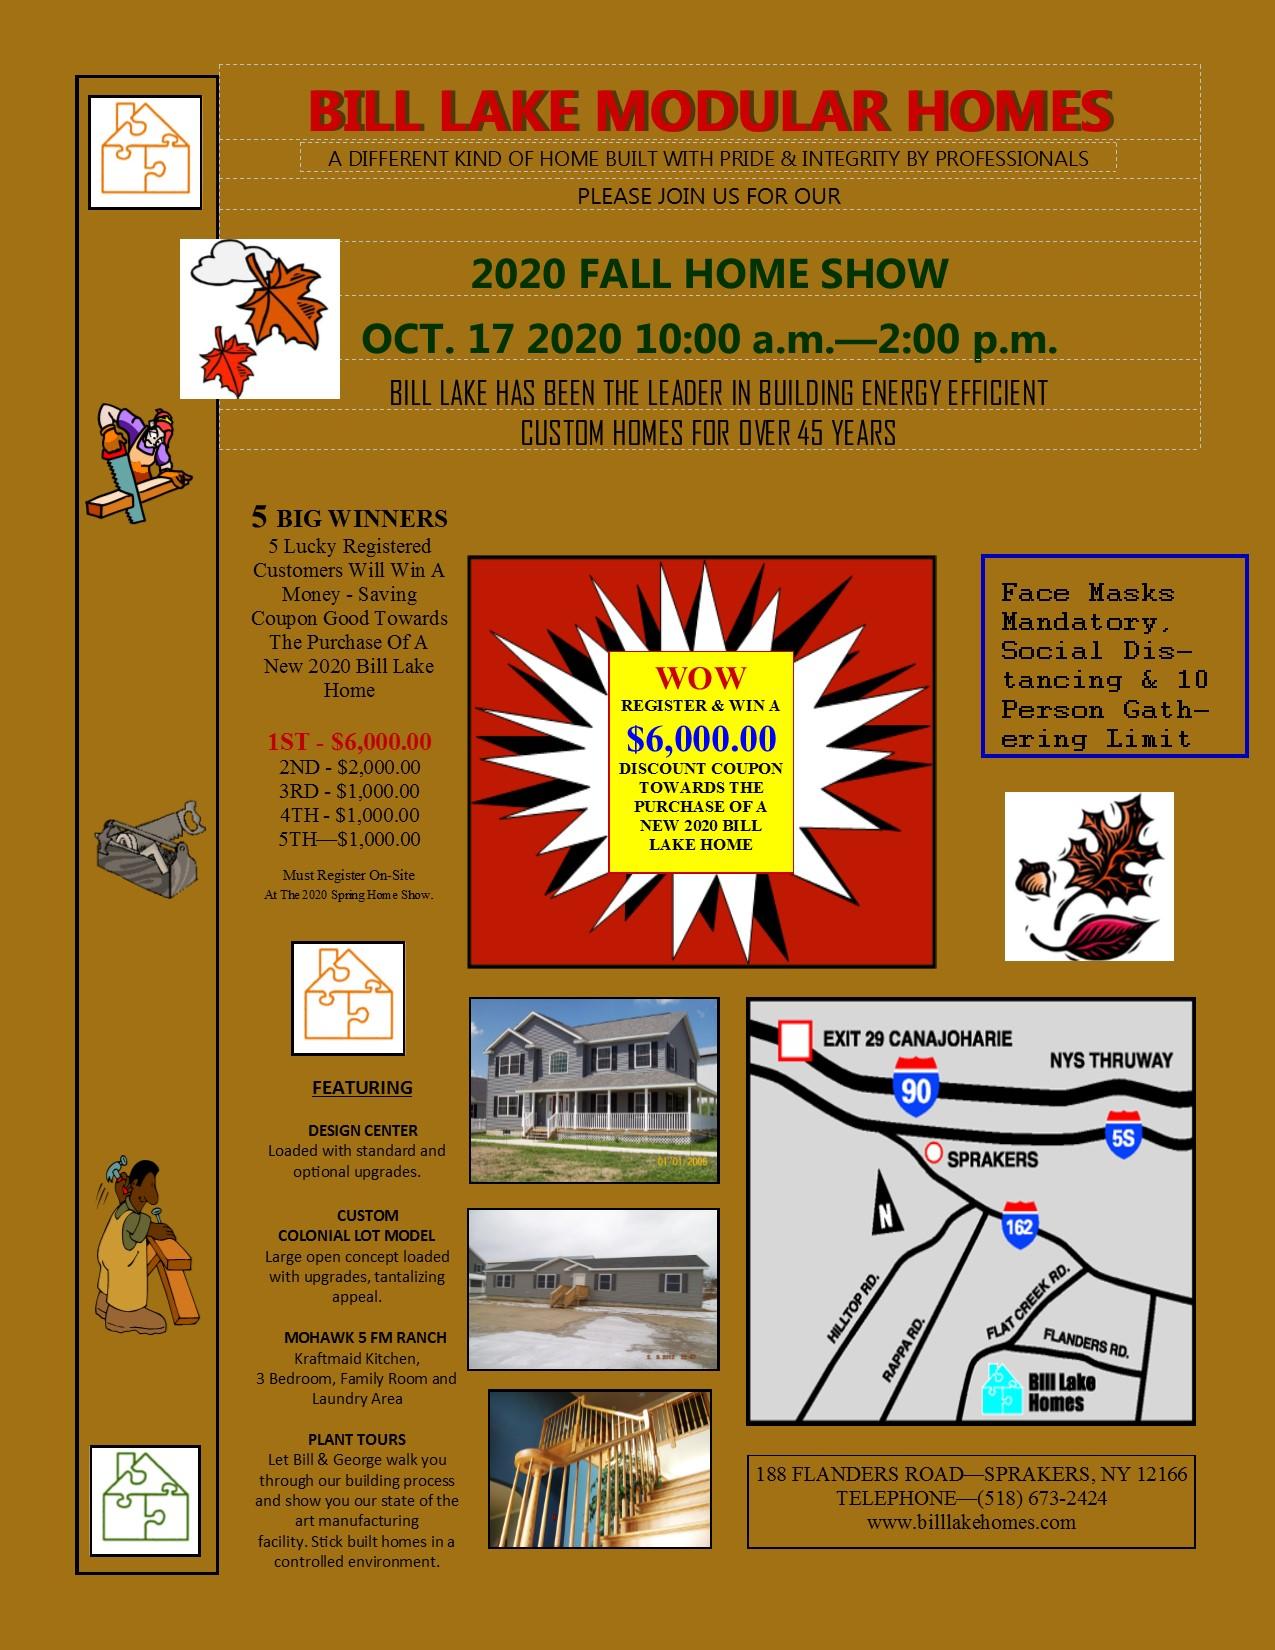 2020 Fall Home Show